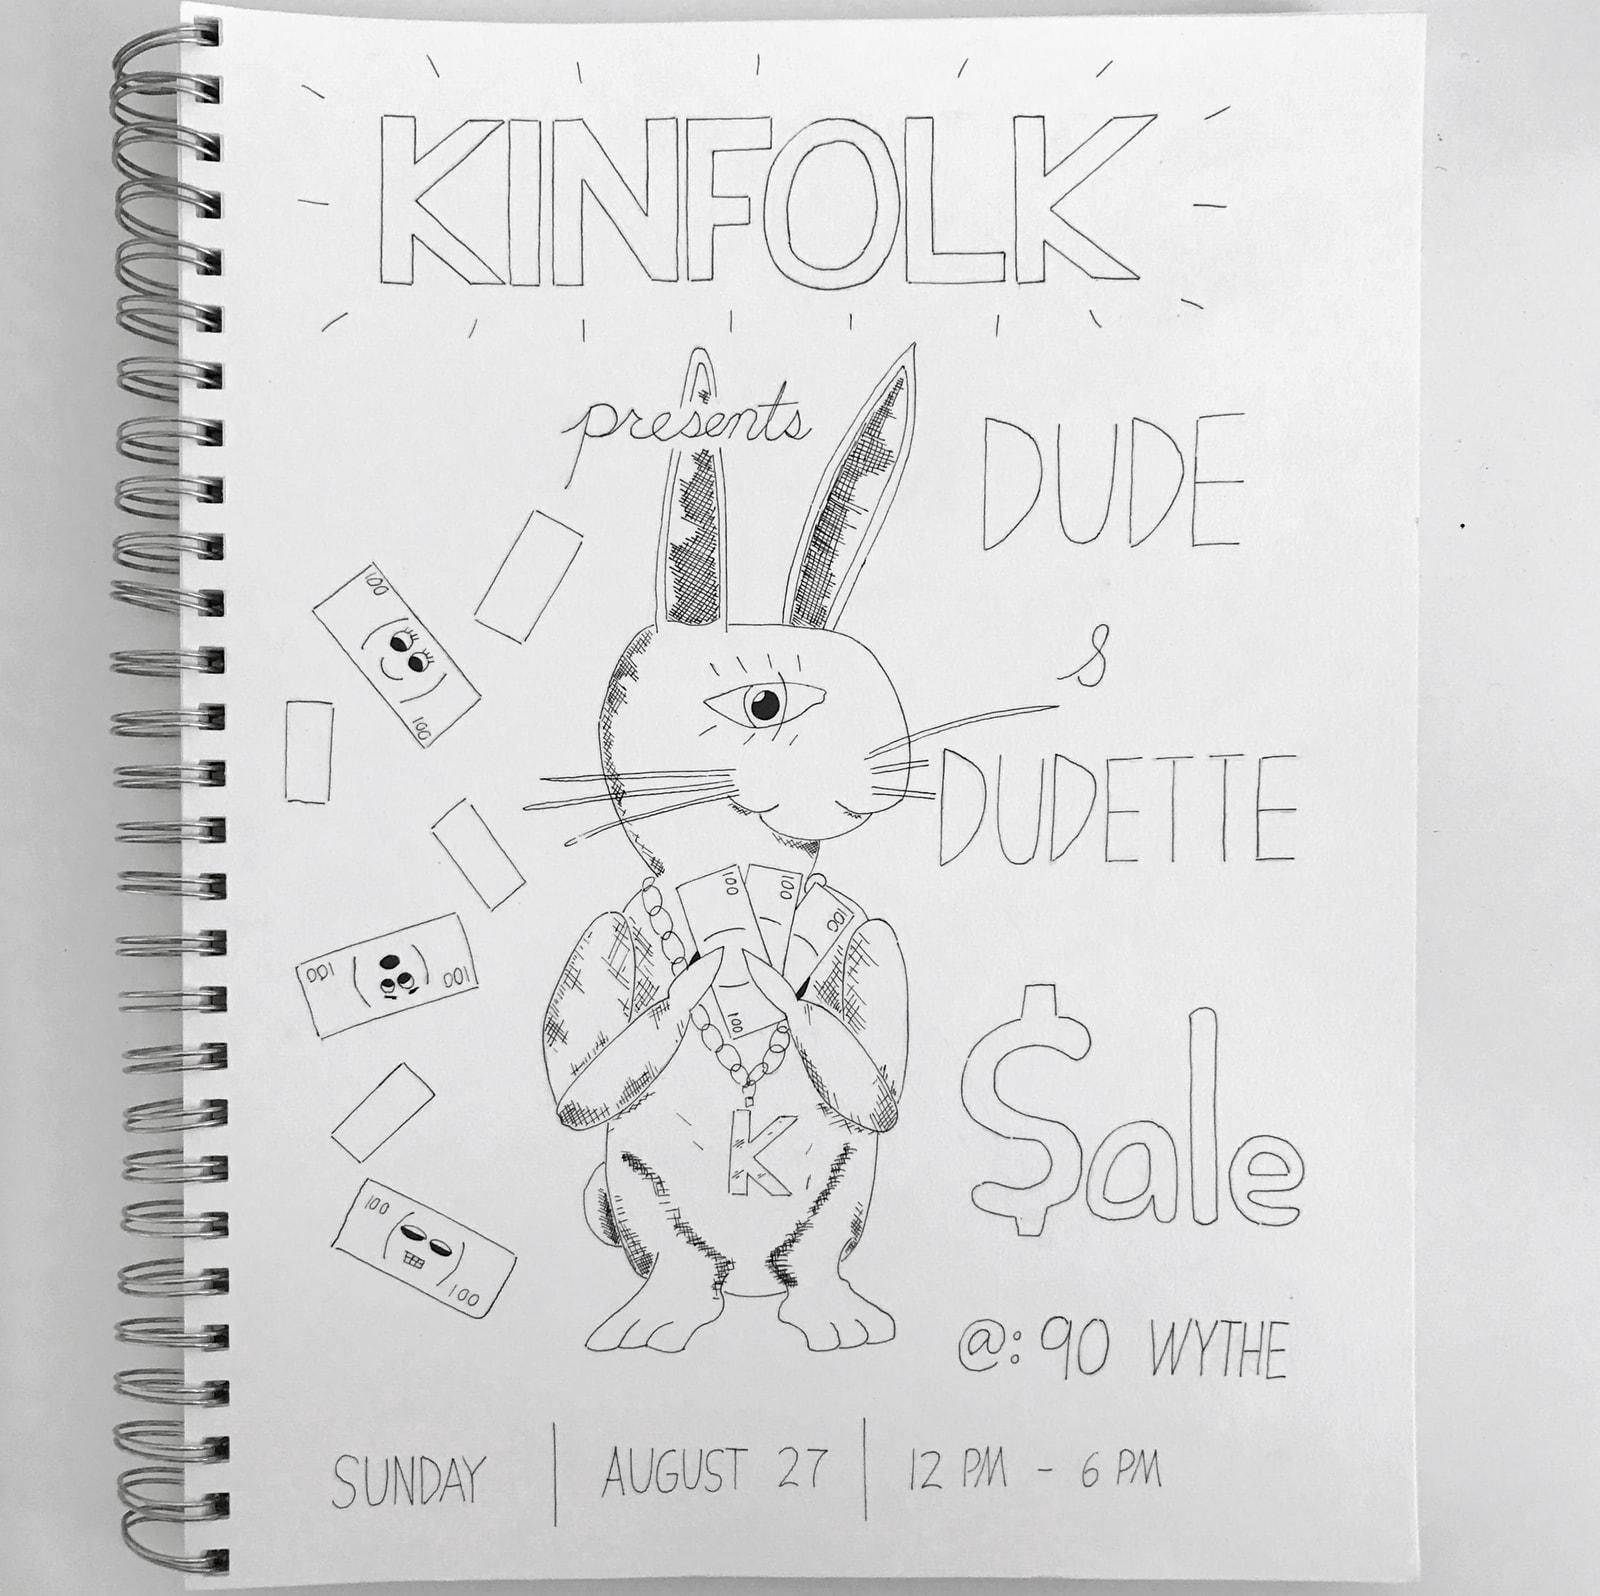 Kinfolk Dude Dudette Sidewalk Sale pop up shop Supreme Bedwin & The Heartbreakers Brain Dead Clothing Apparel Fashion Accessories new york nyc city brooklyn store retail